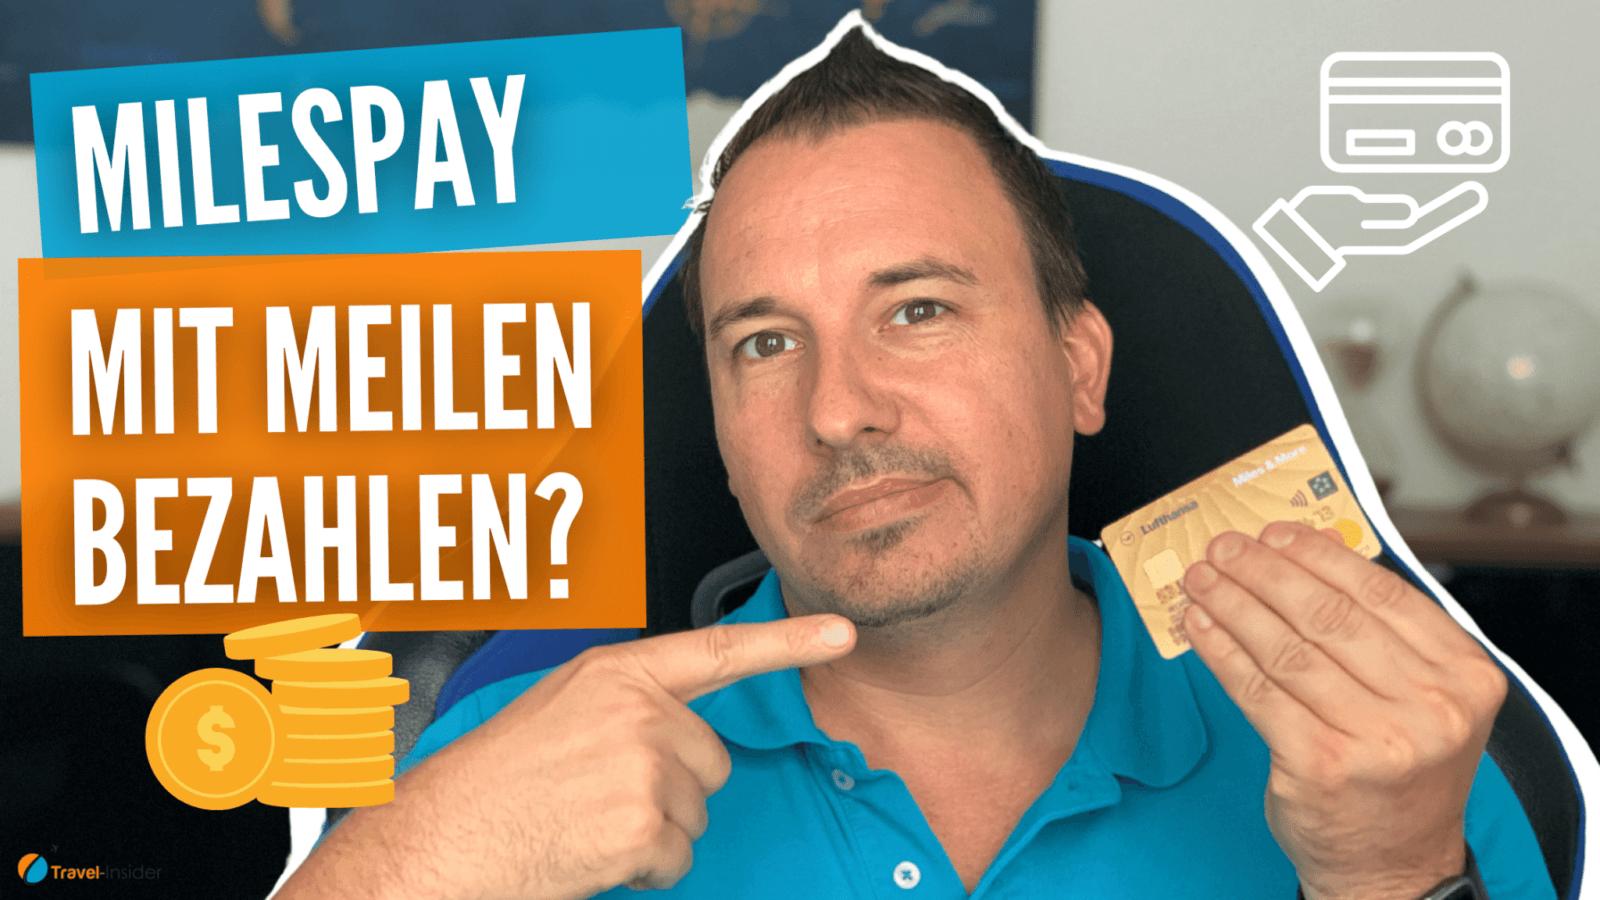 MilesPay – Die Alternative Bezahlmethode für die Miles & More Kreditkarte